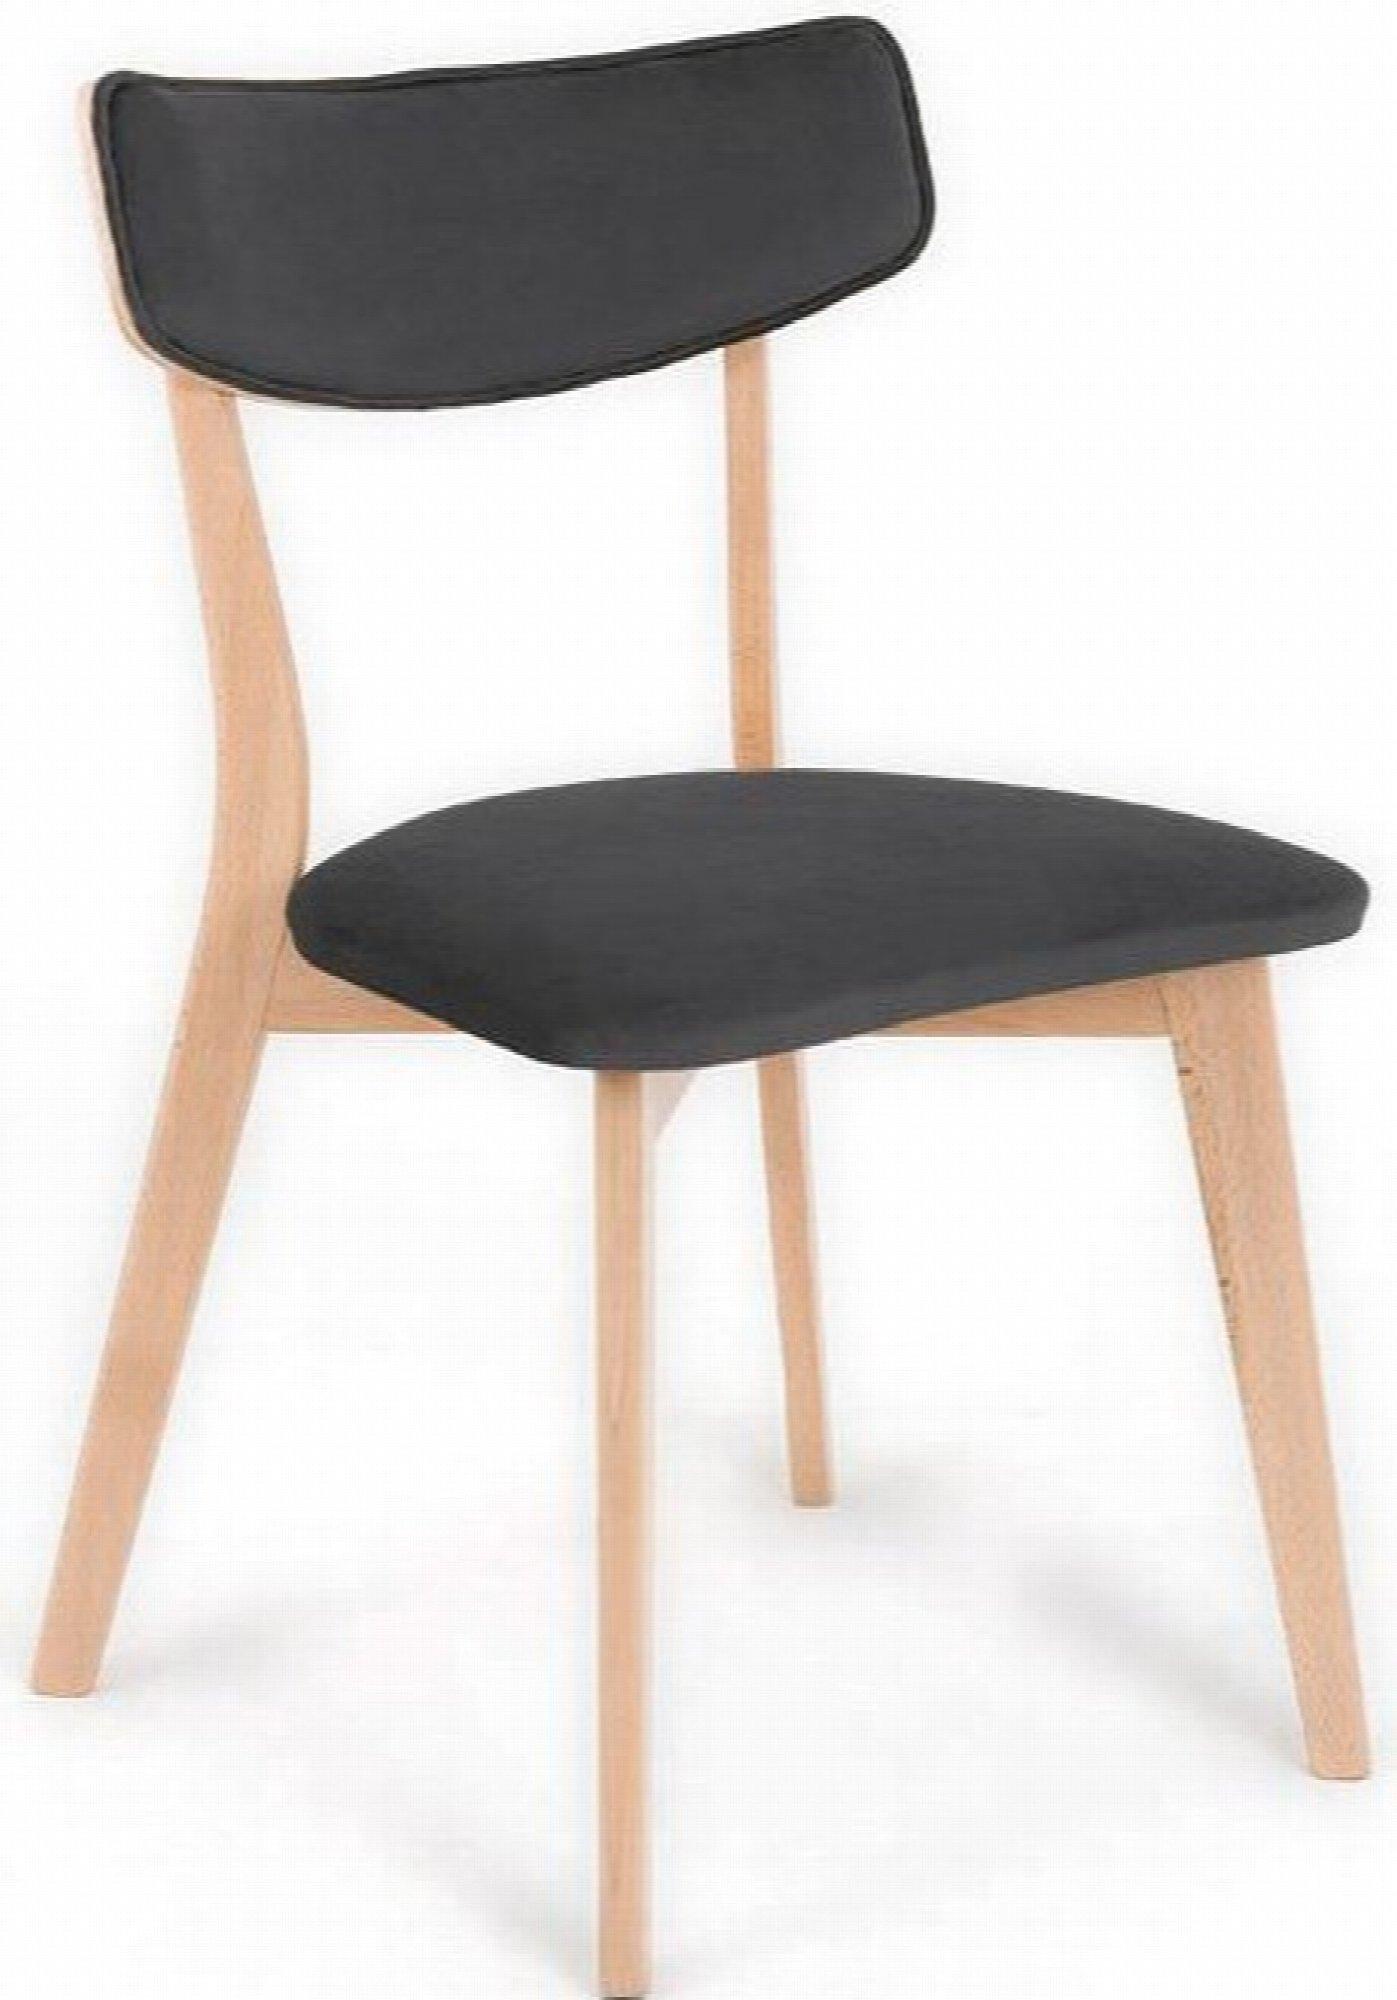 Chaise design tradition velours gris pieds bois clair